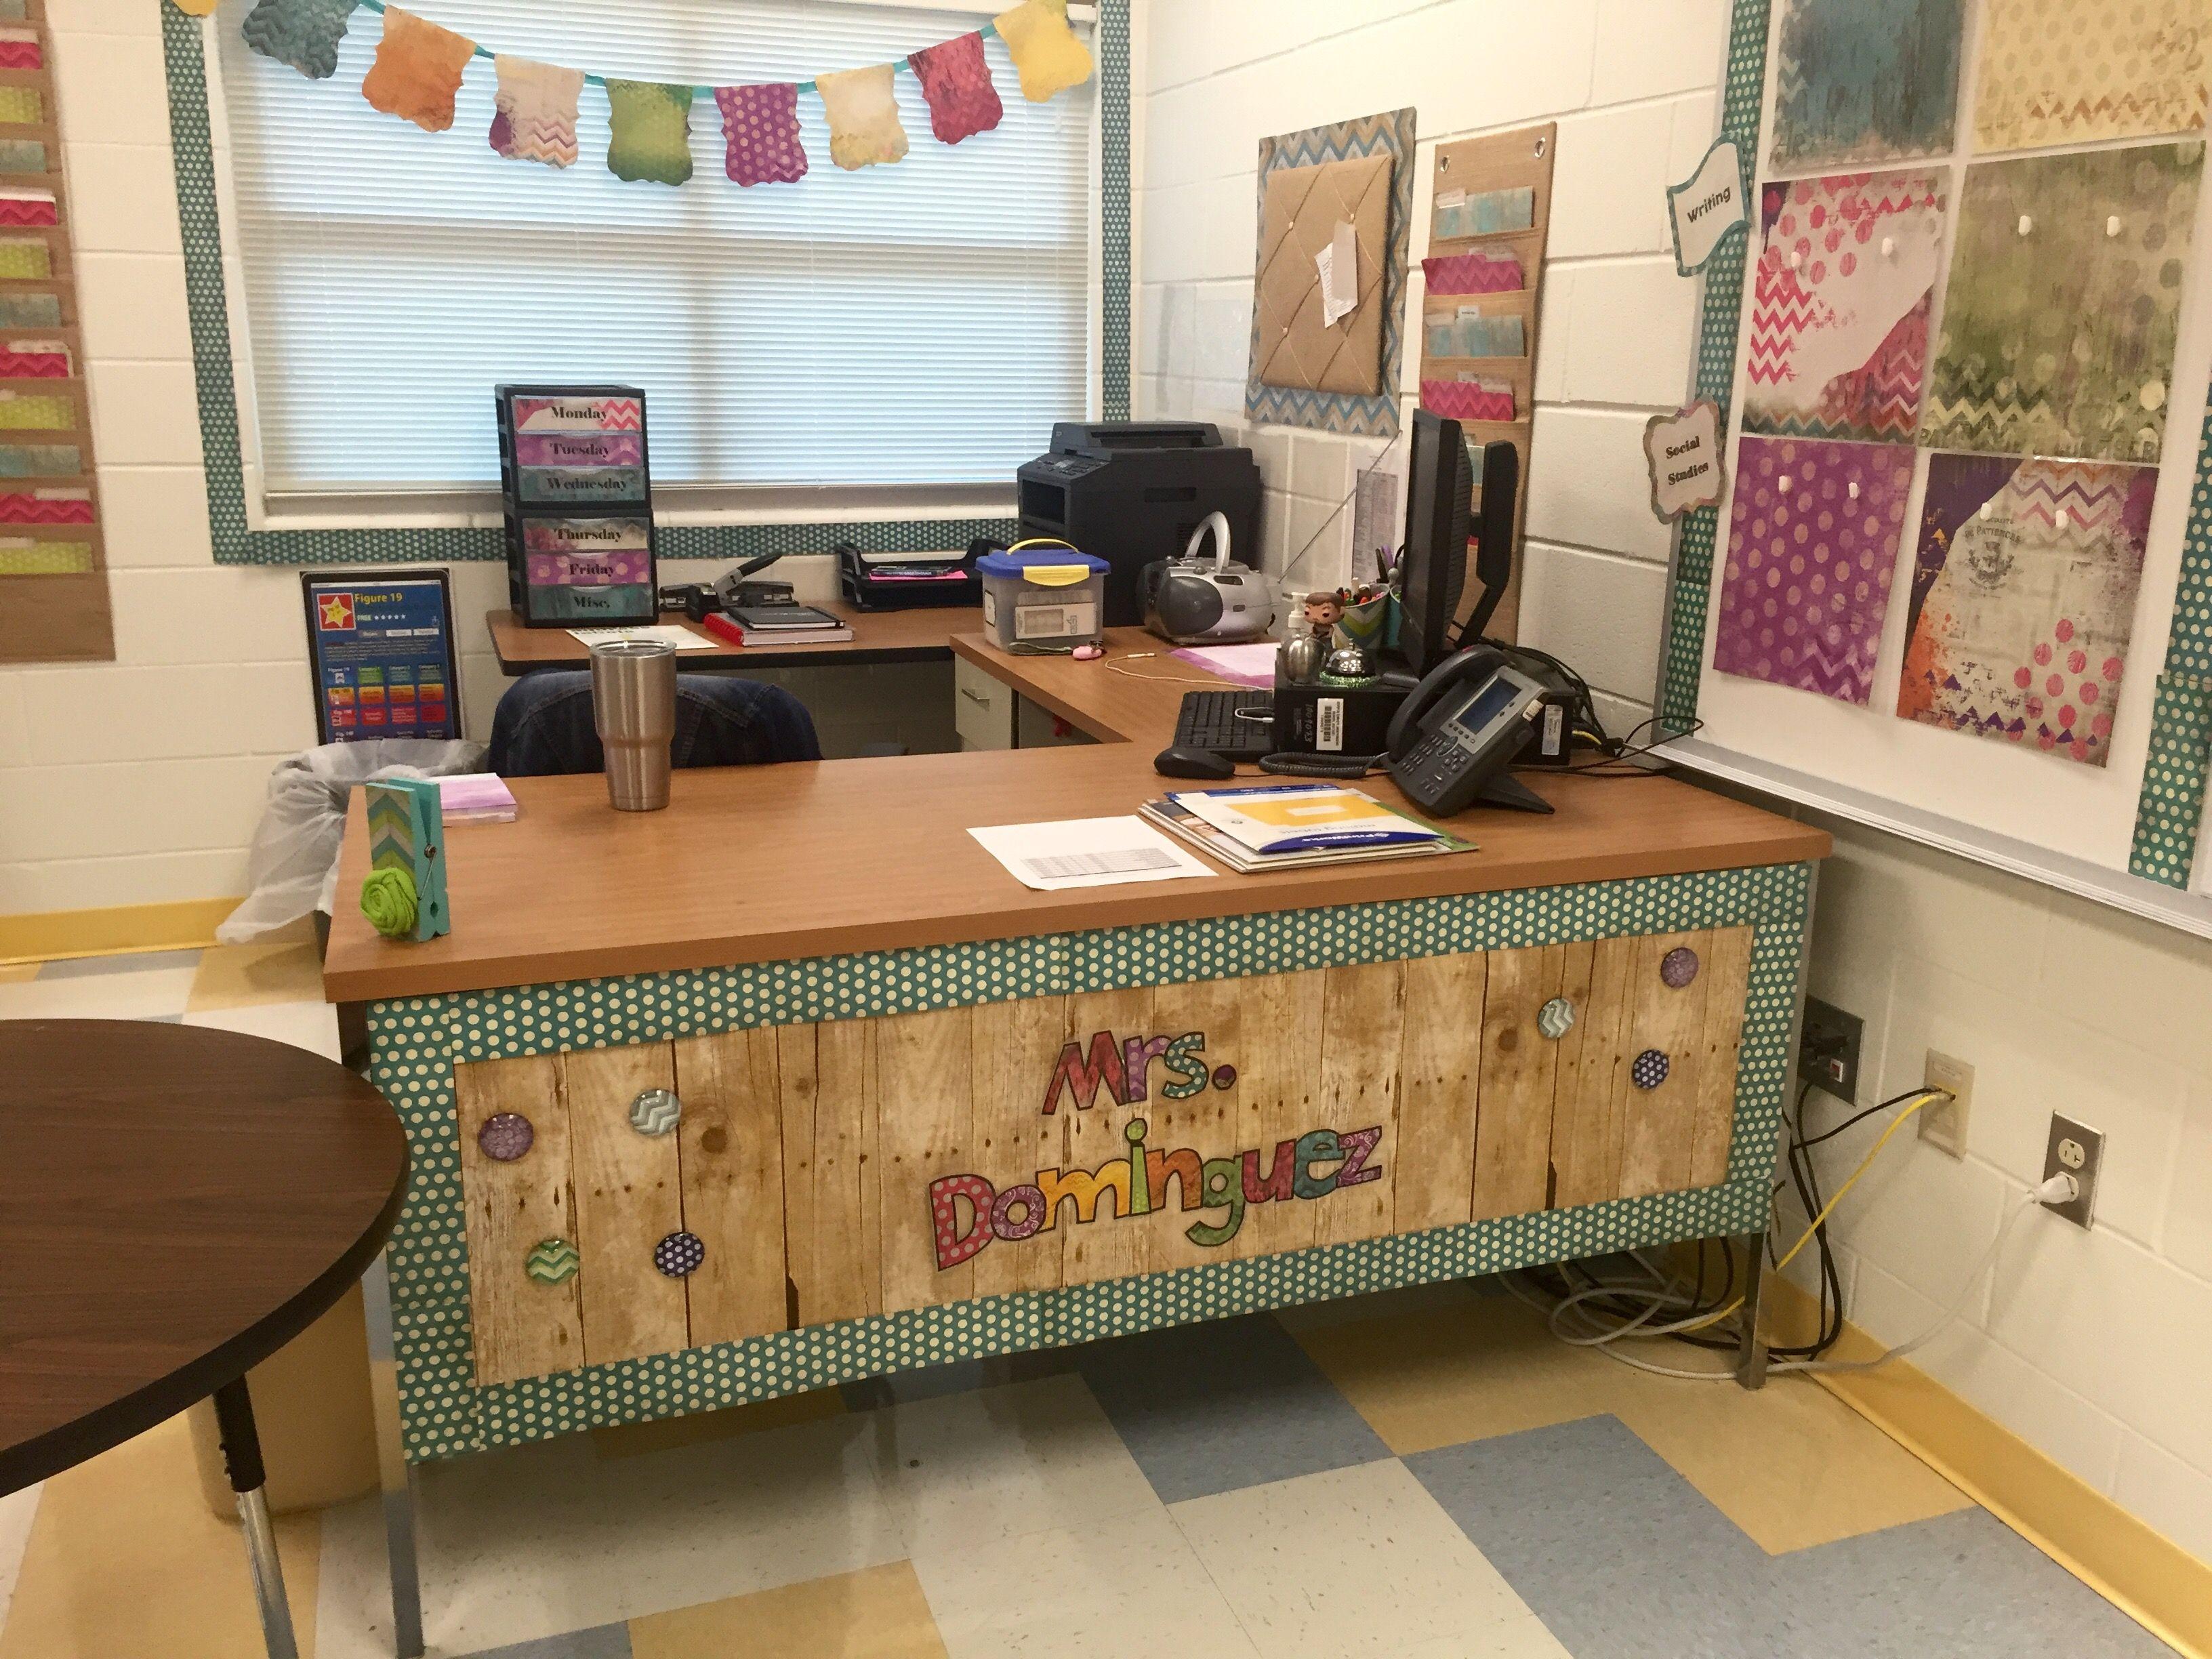 47 Best Classroom Decoration Ideas 32 Design And Decoration History Teacher Classroom Teacher Classroom Decorations Classroom Goals